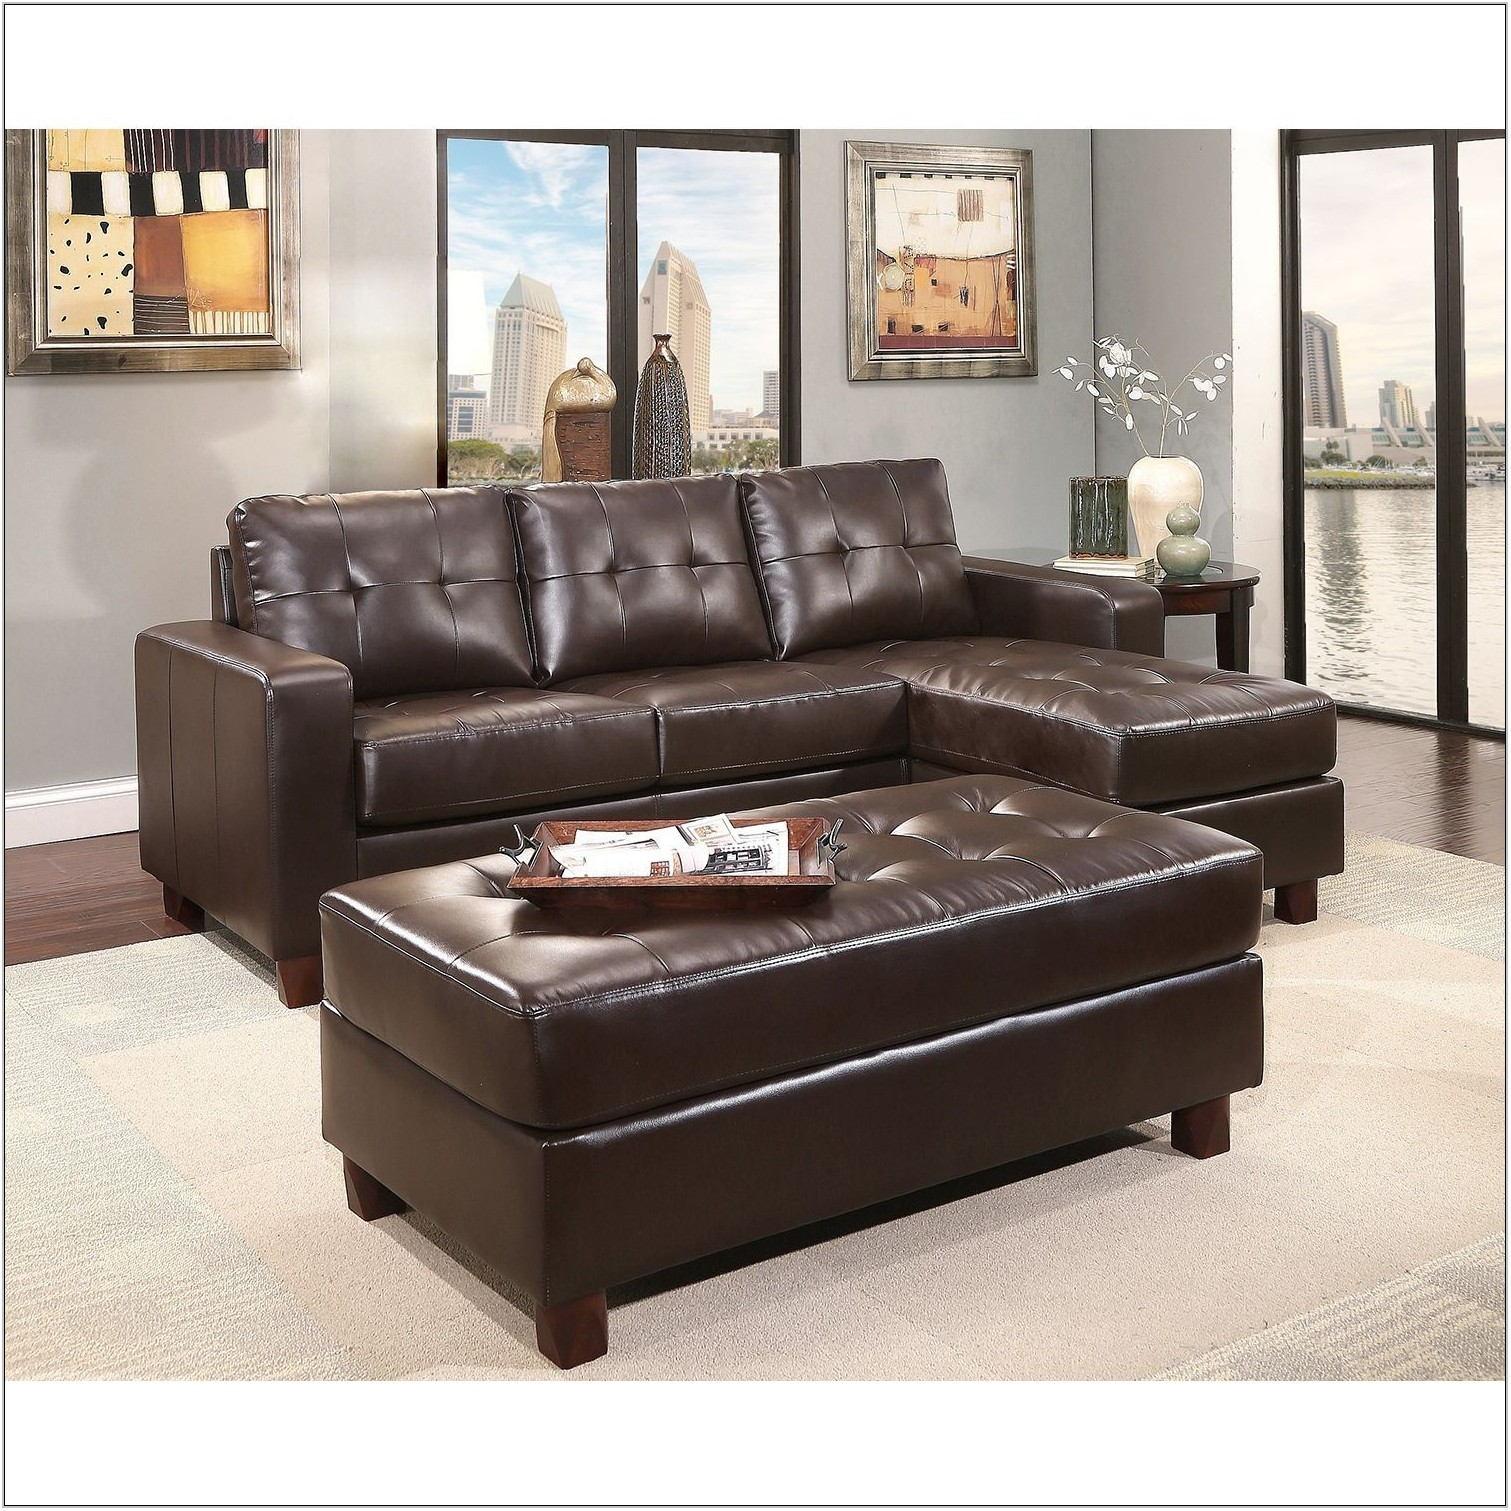 Sams Club Leather Living Room Furniture